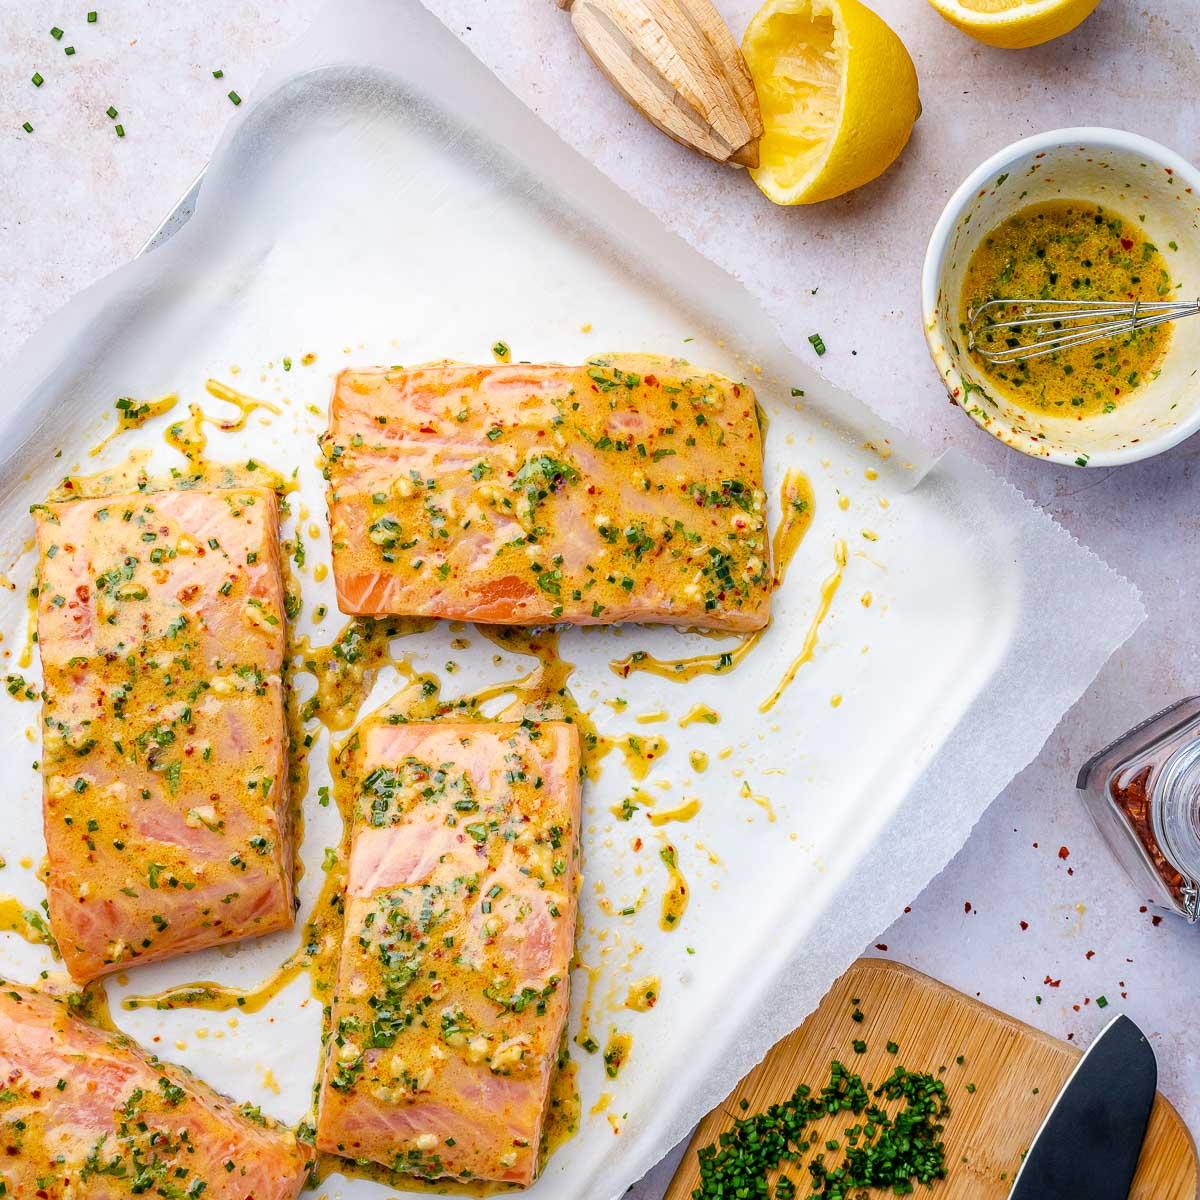 Keto Baked Salmon Recipe - 5